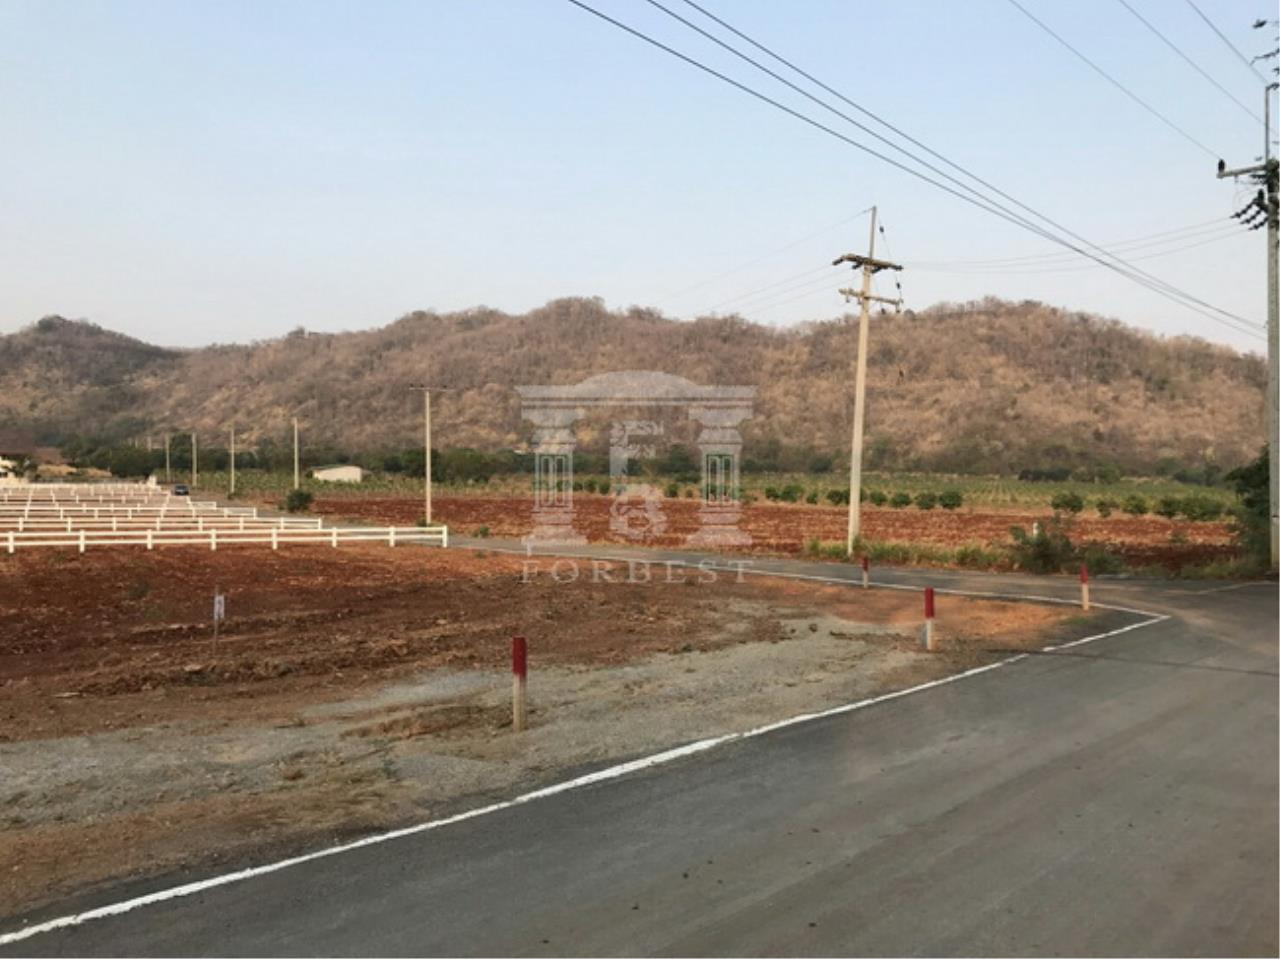 37228-Land for sale, on Thanarat rd. (Khao yai), 1 rai